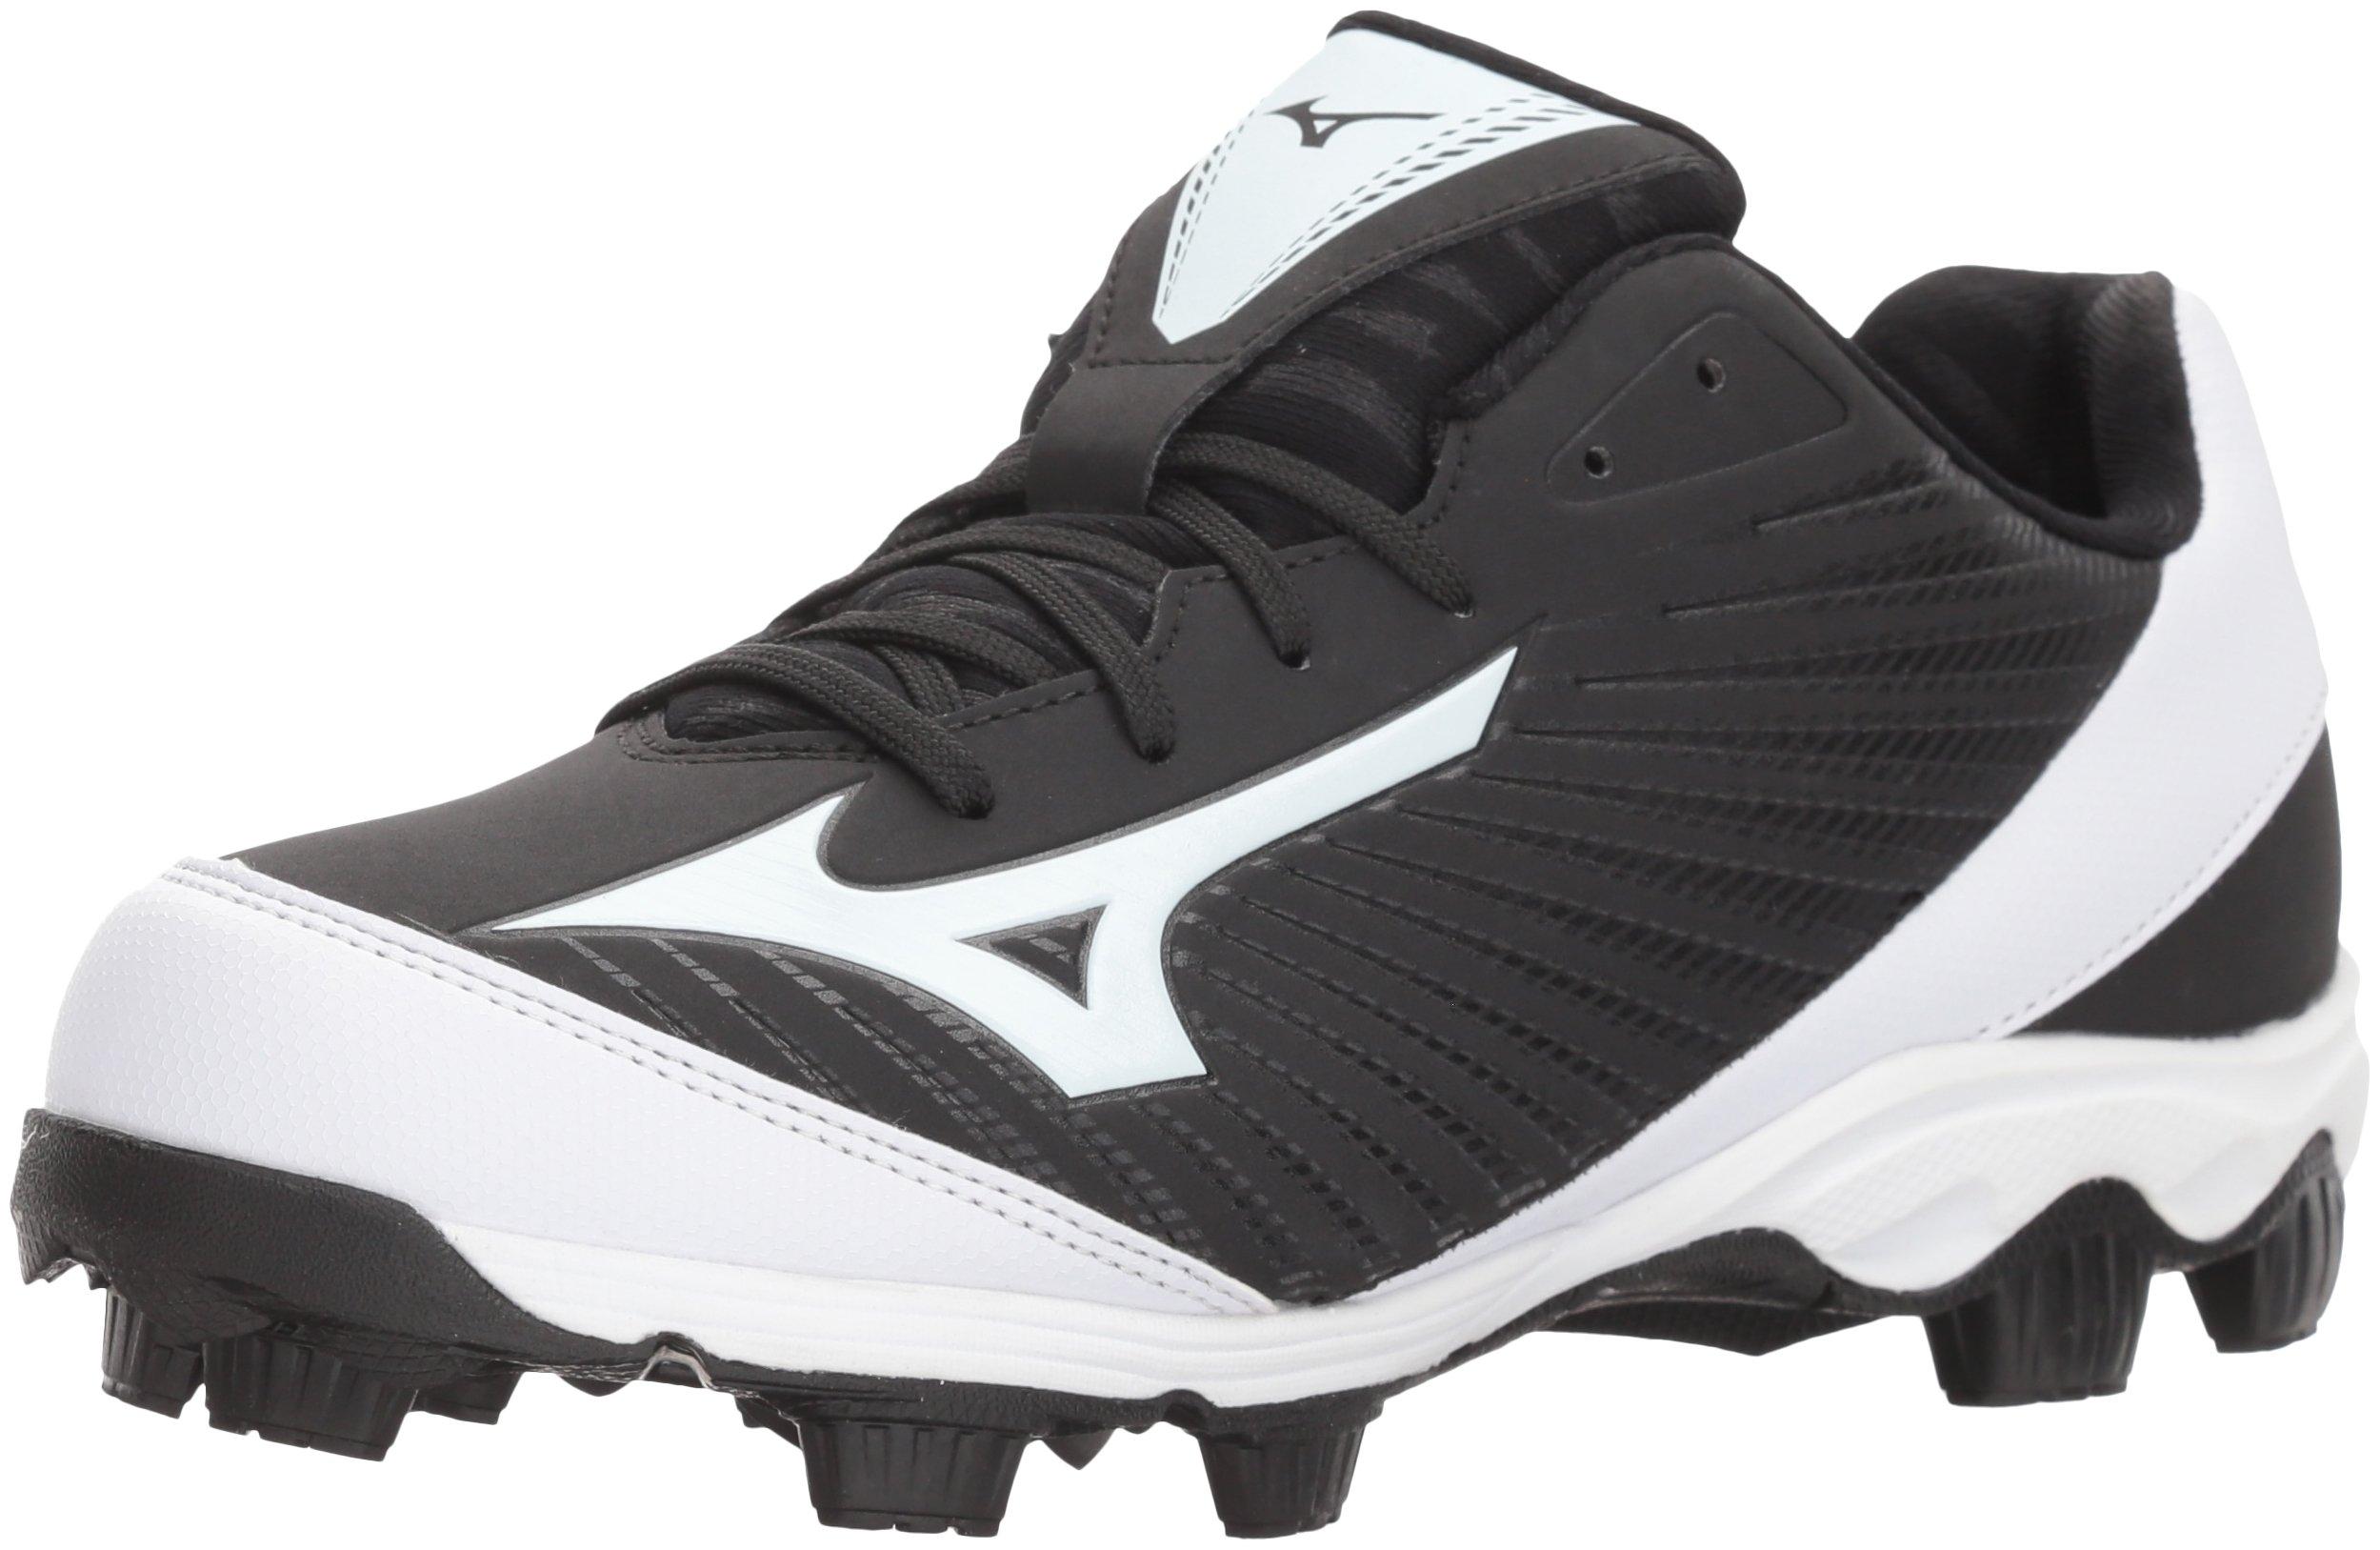 Mizuno (MIZD9)) Women's 9-Spike Advanced Finch Franchise 7 Fastpitch Cleat Softball Shoe, Black/White, 7 B US